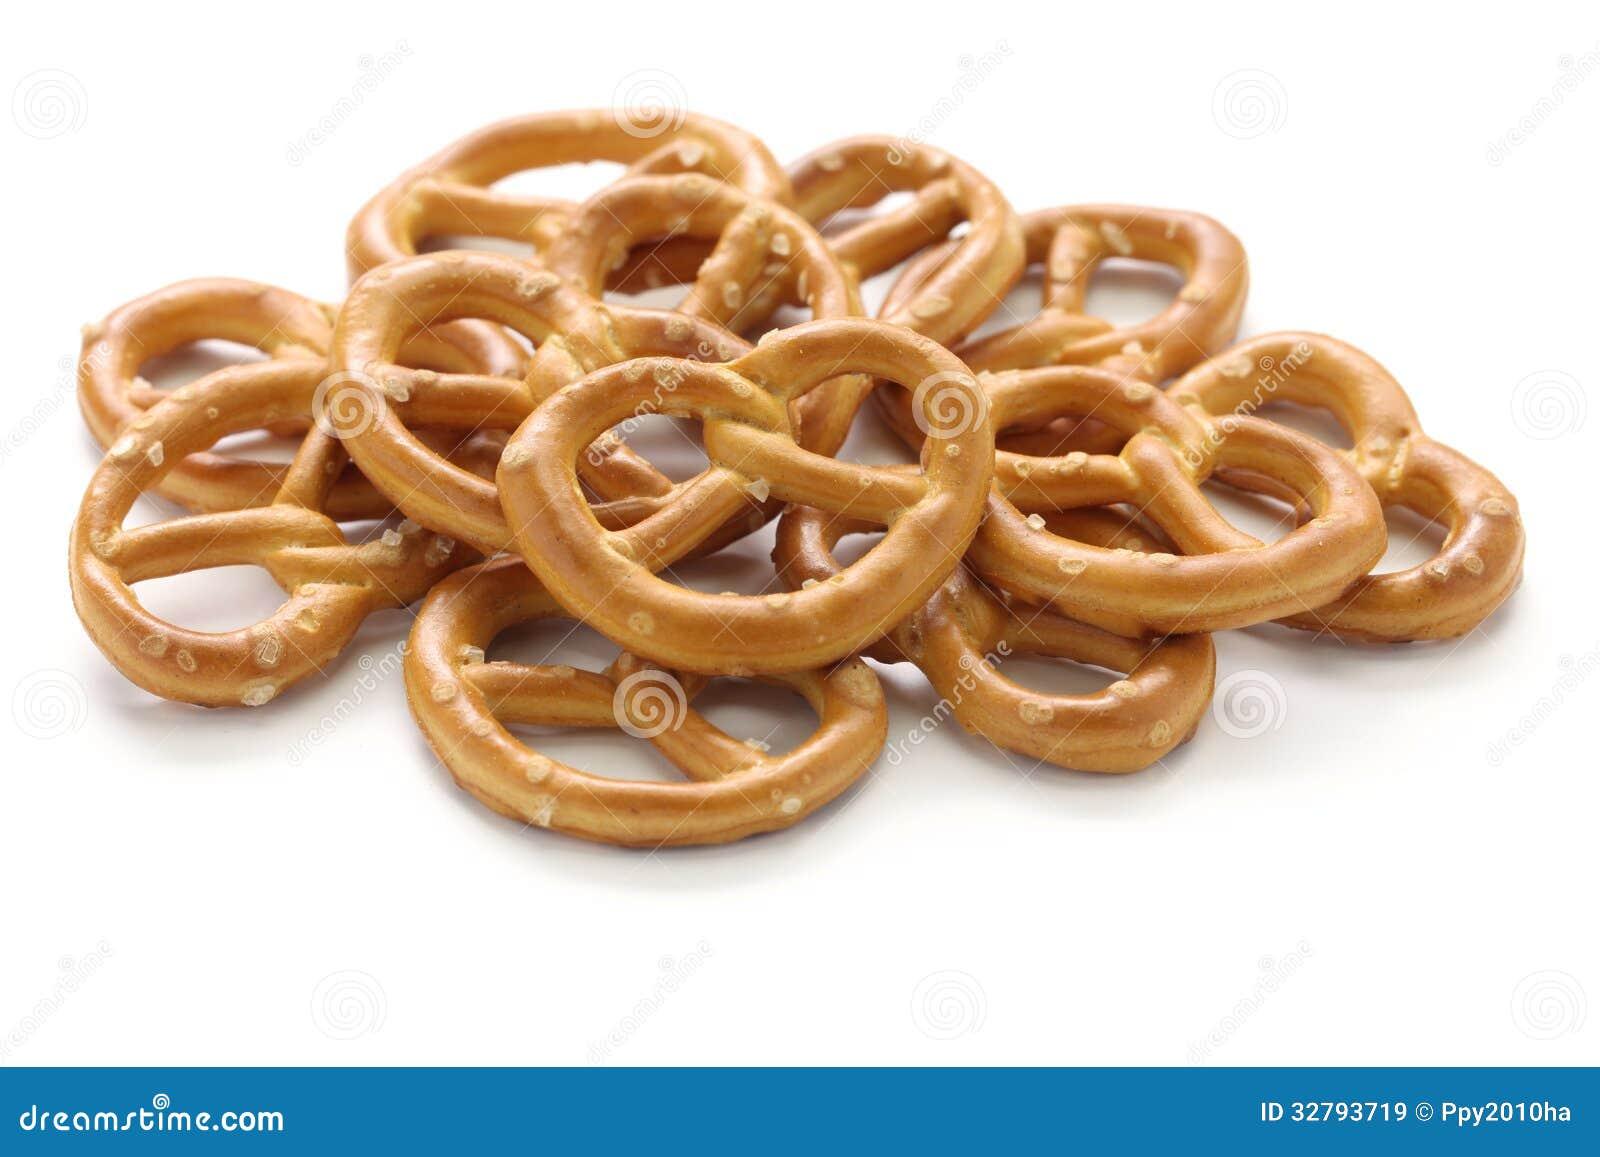 pretzel business plan